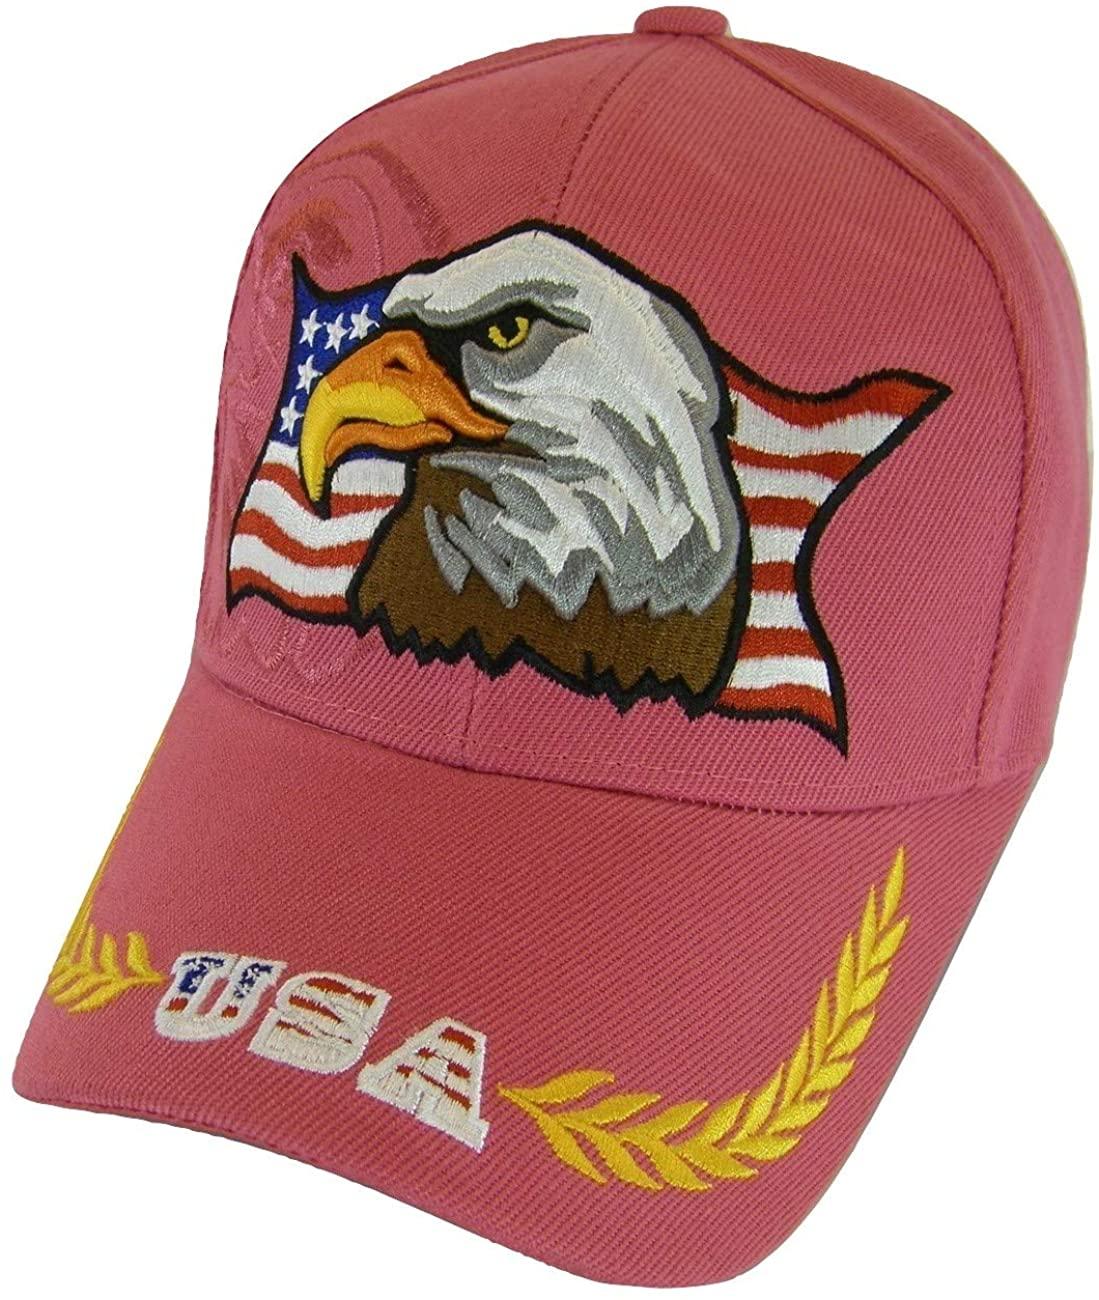 Men's Patriotic Large Eagle USA Adjustable Baseball Cap